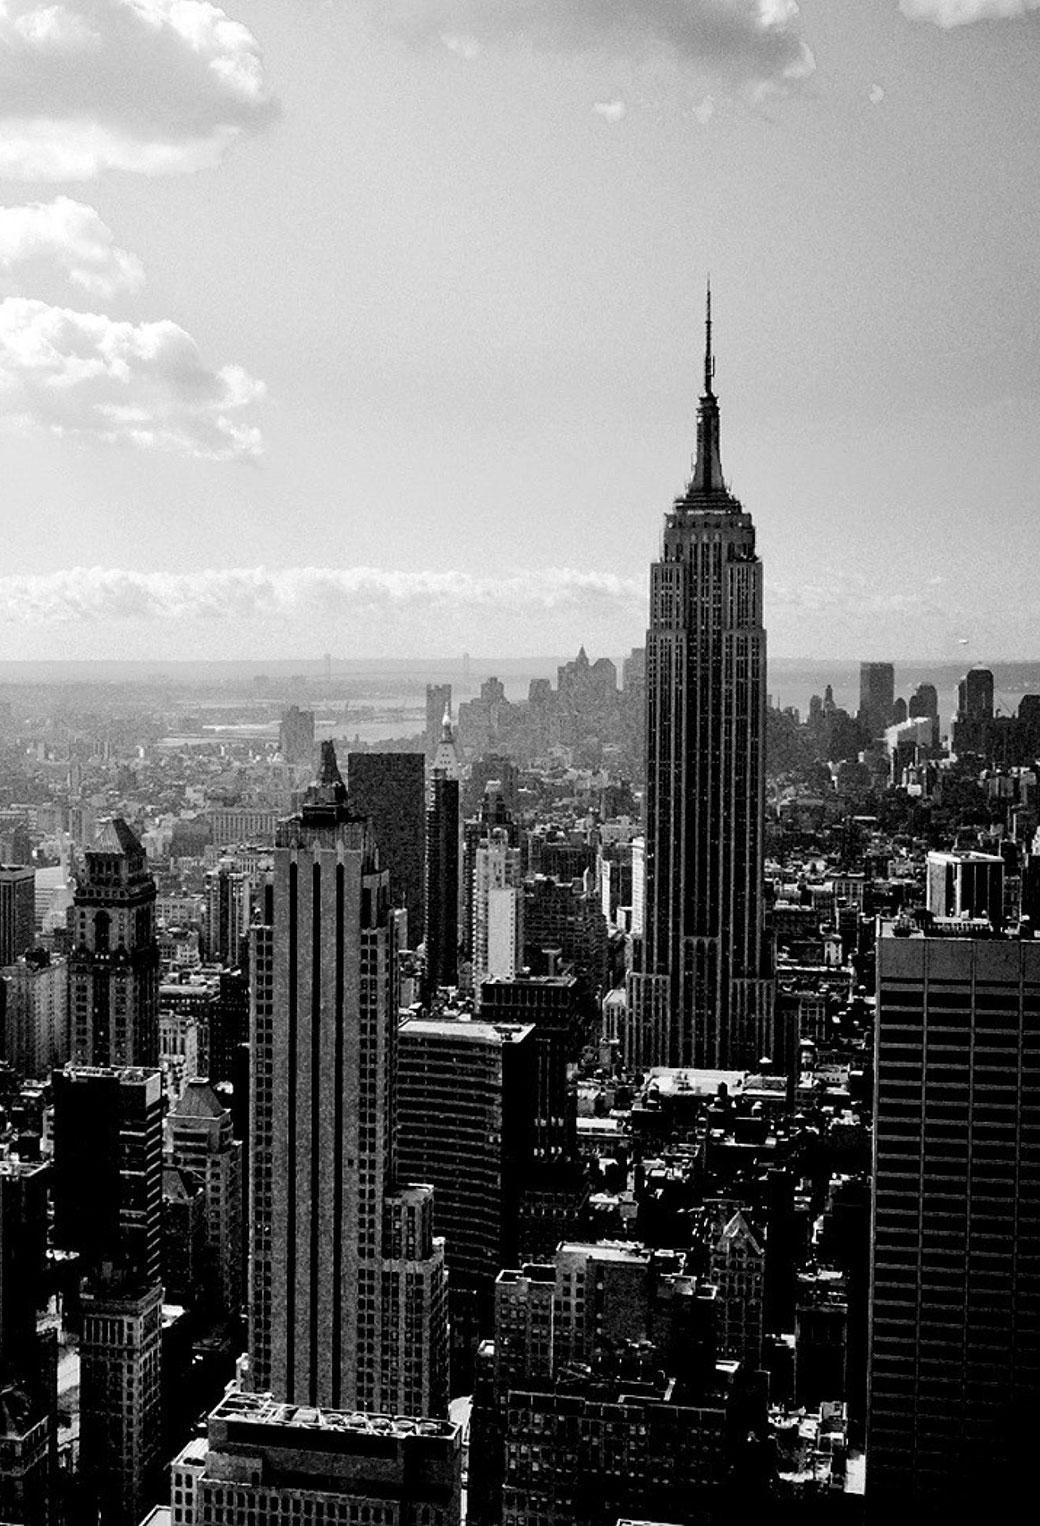 Nature wallpaper dark ocean wallpaper 1080p for desktop background - Wallpaper Hd Iphone New York City Free Download